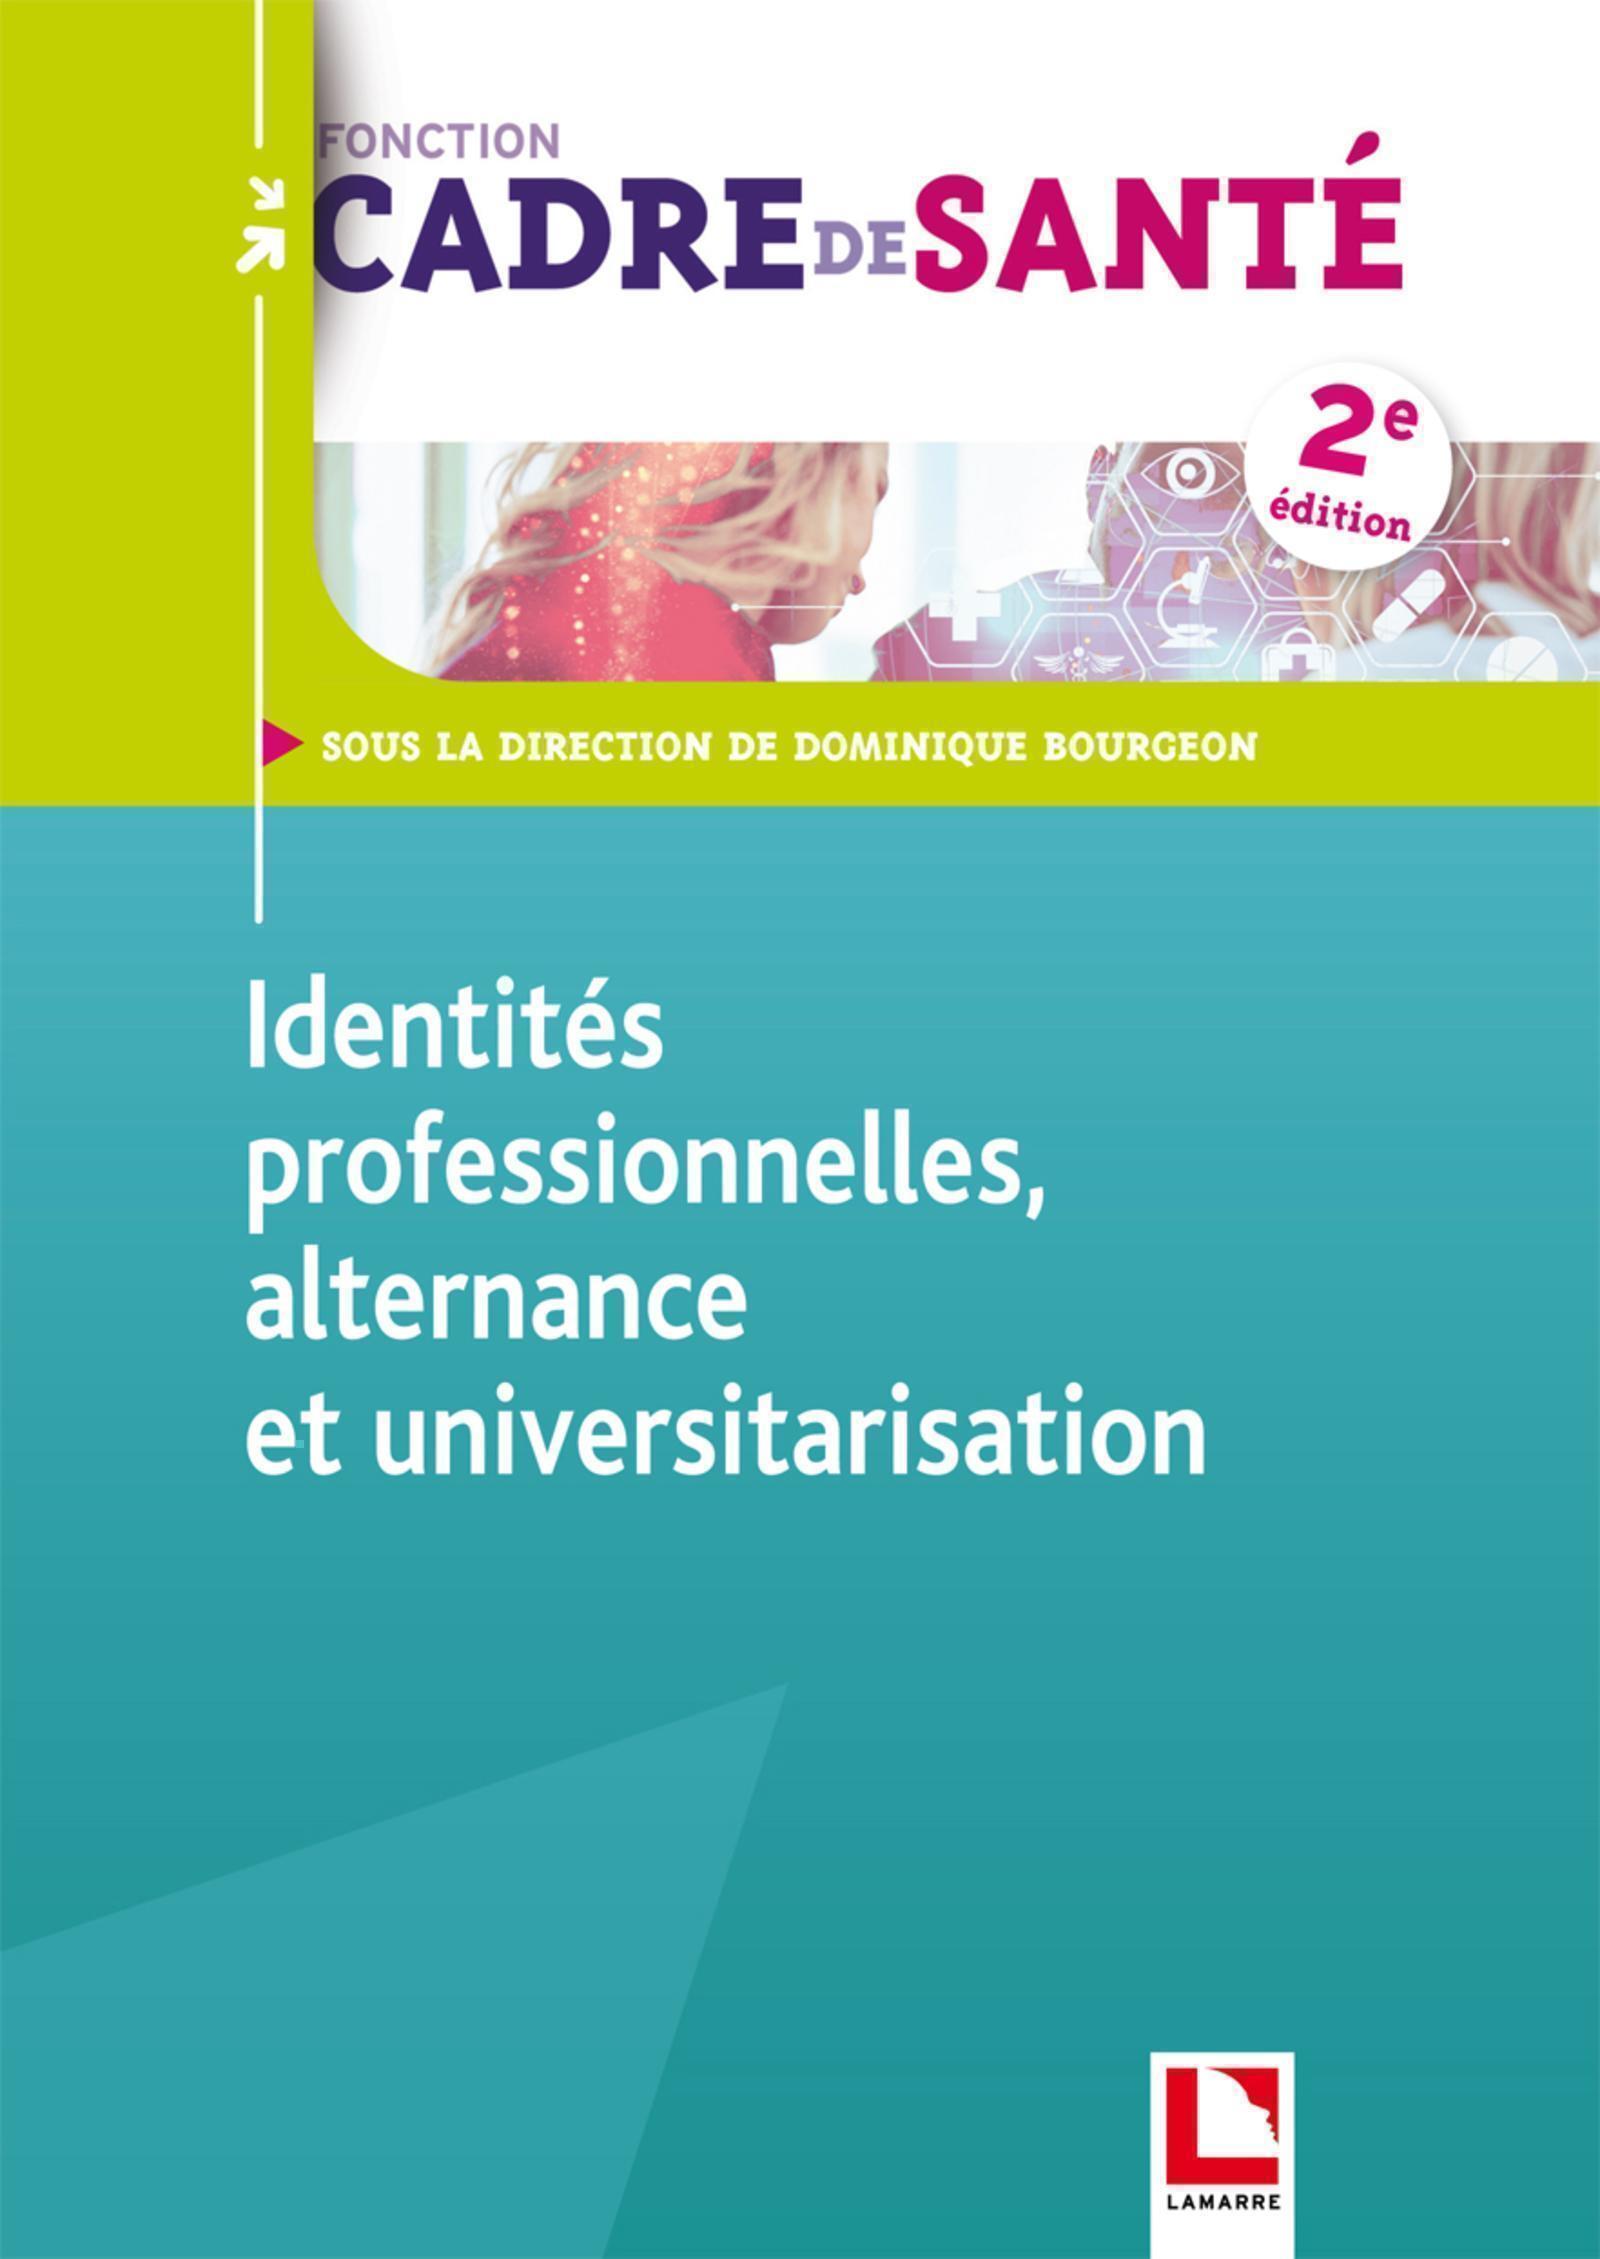 IDENTITES PROFESSIONNELLES, ALTERNANCE ET UNIVERSITARISATION